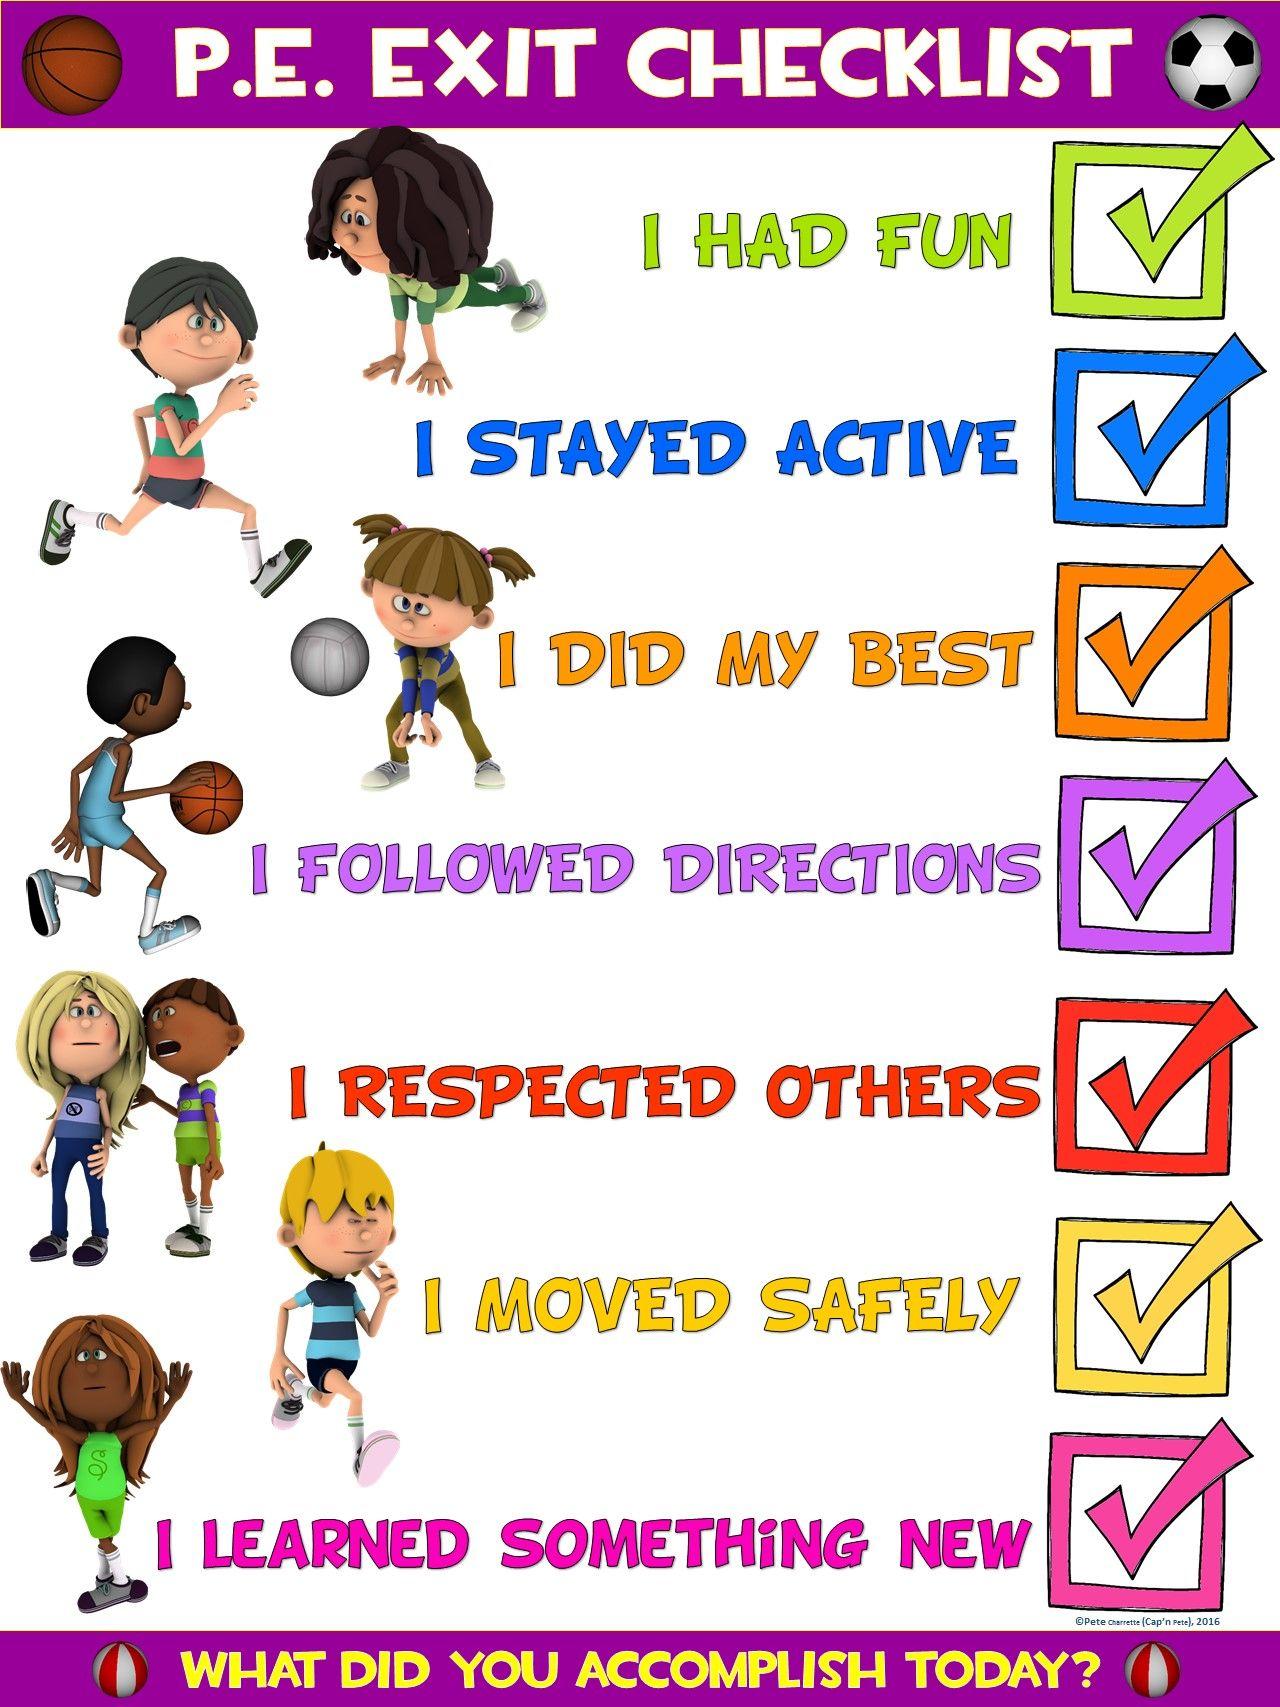 PE Poster: Physical Education Exit Checklist | P.E. | Pinterest ...